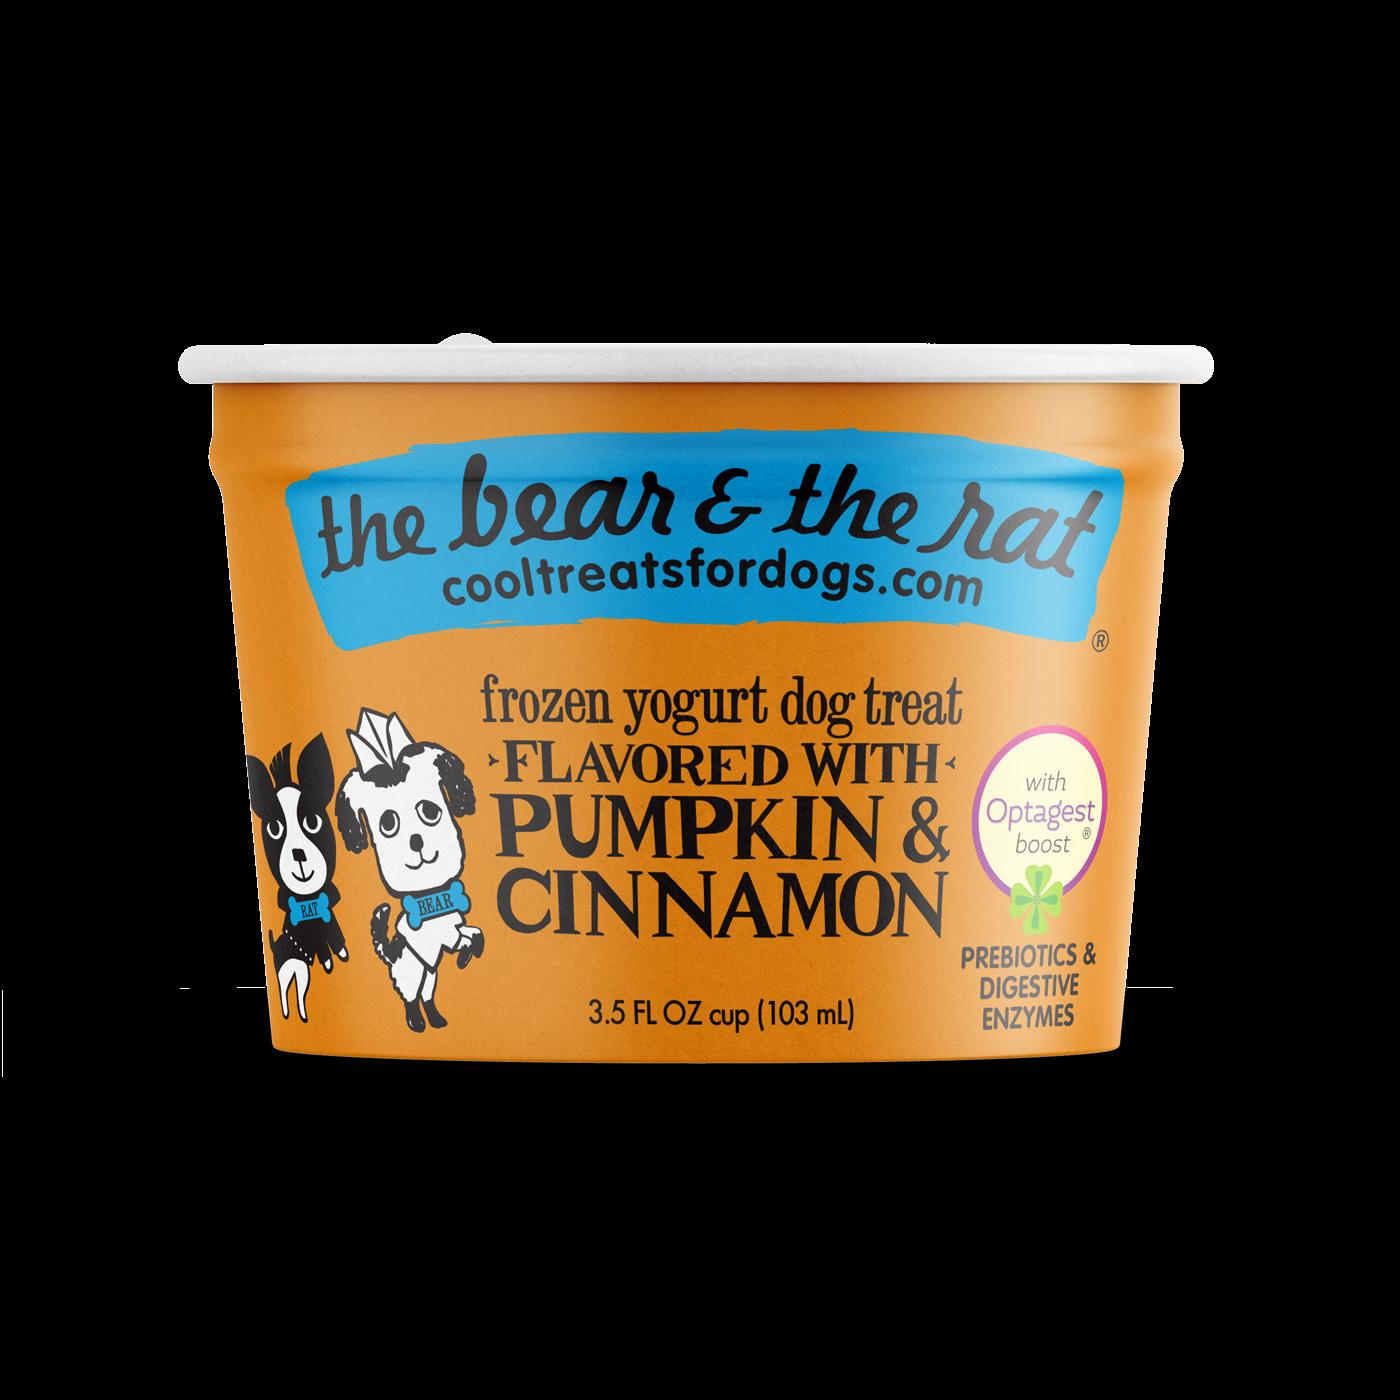 The Bear & The Rat Pumpkin & Cinnamon Frozen Yogurt Dog Treats, 3.5-oz, Single Cup